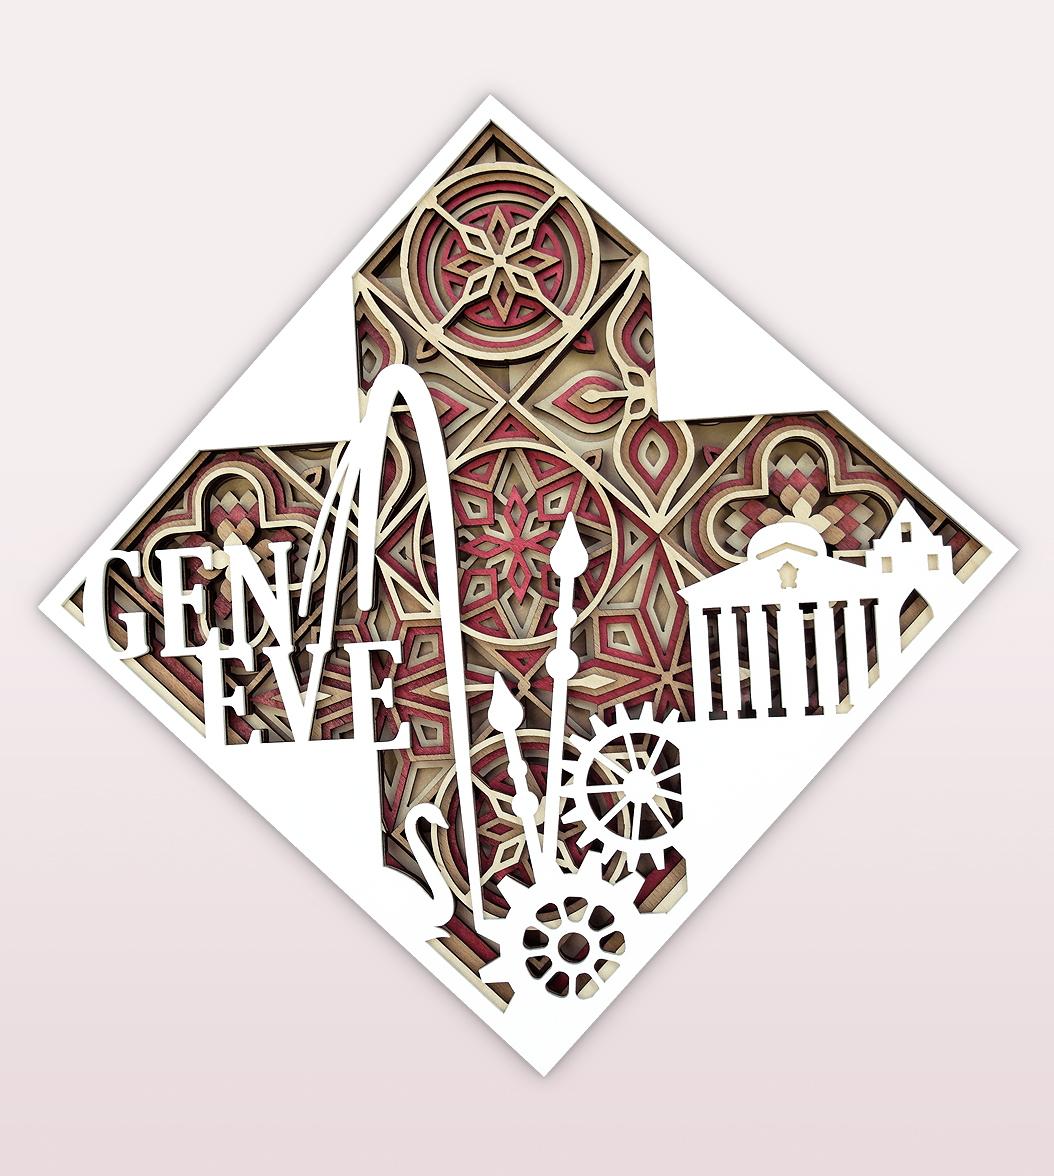 GENEVE_1